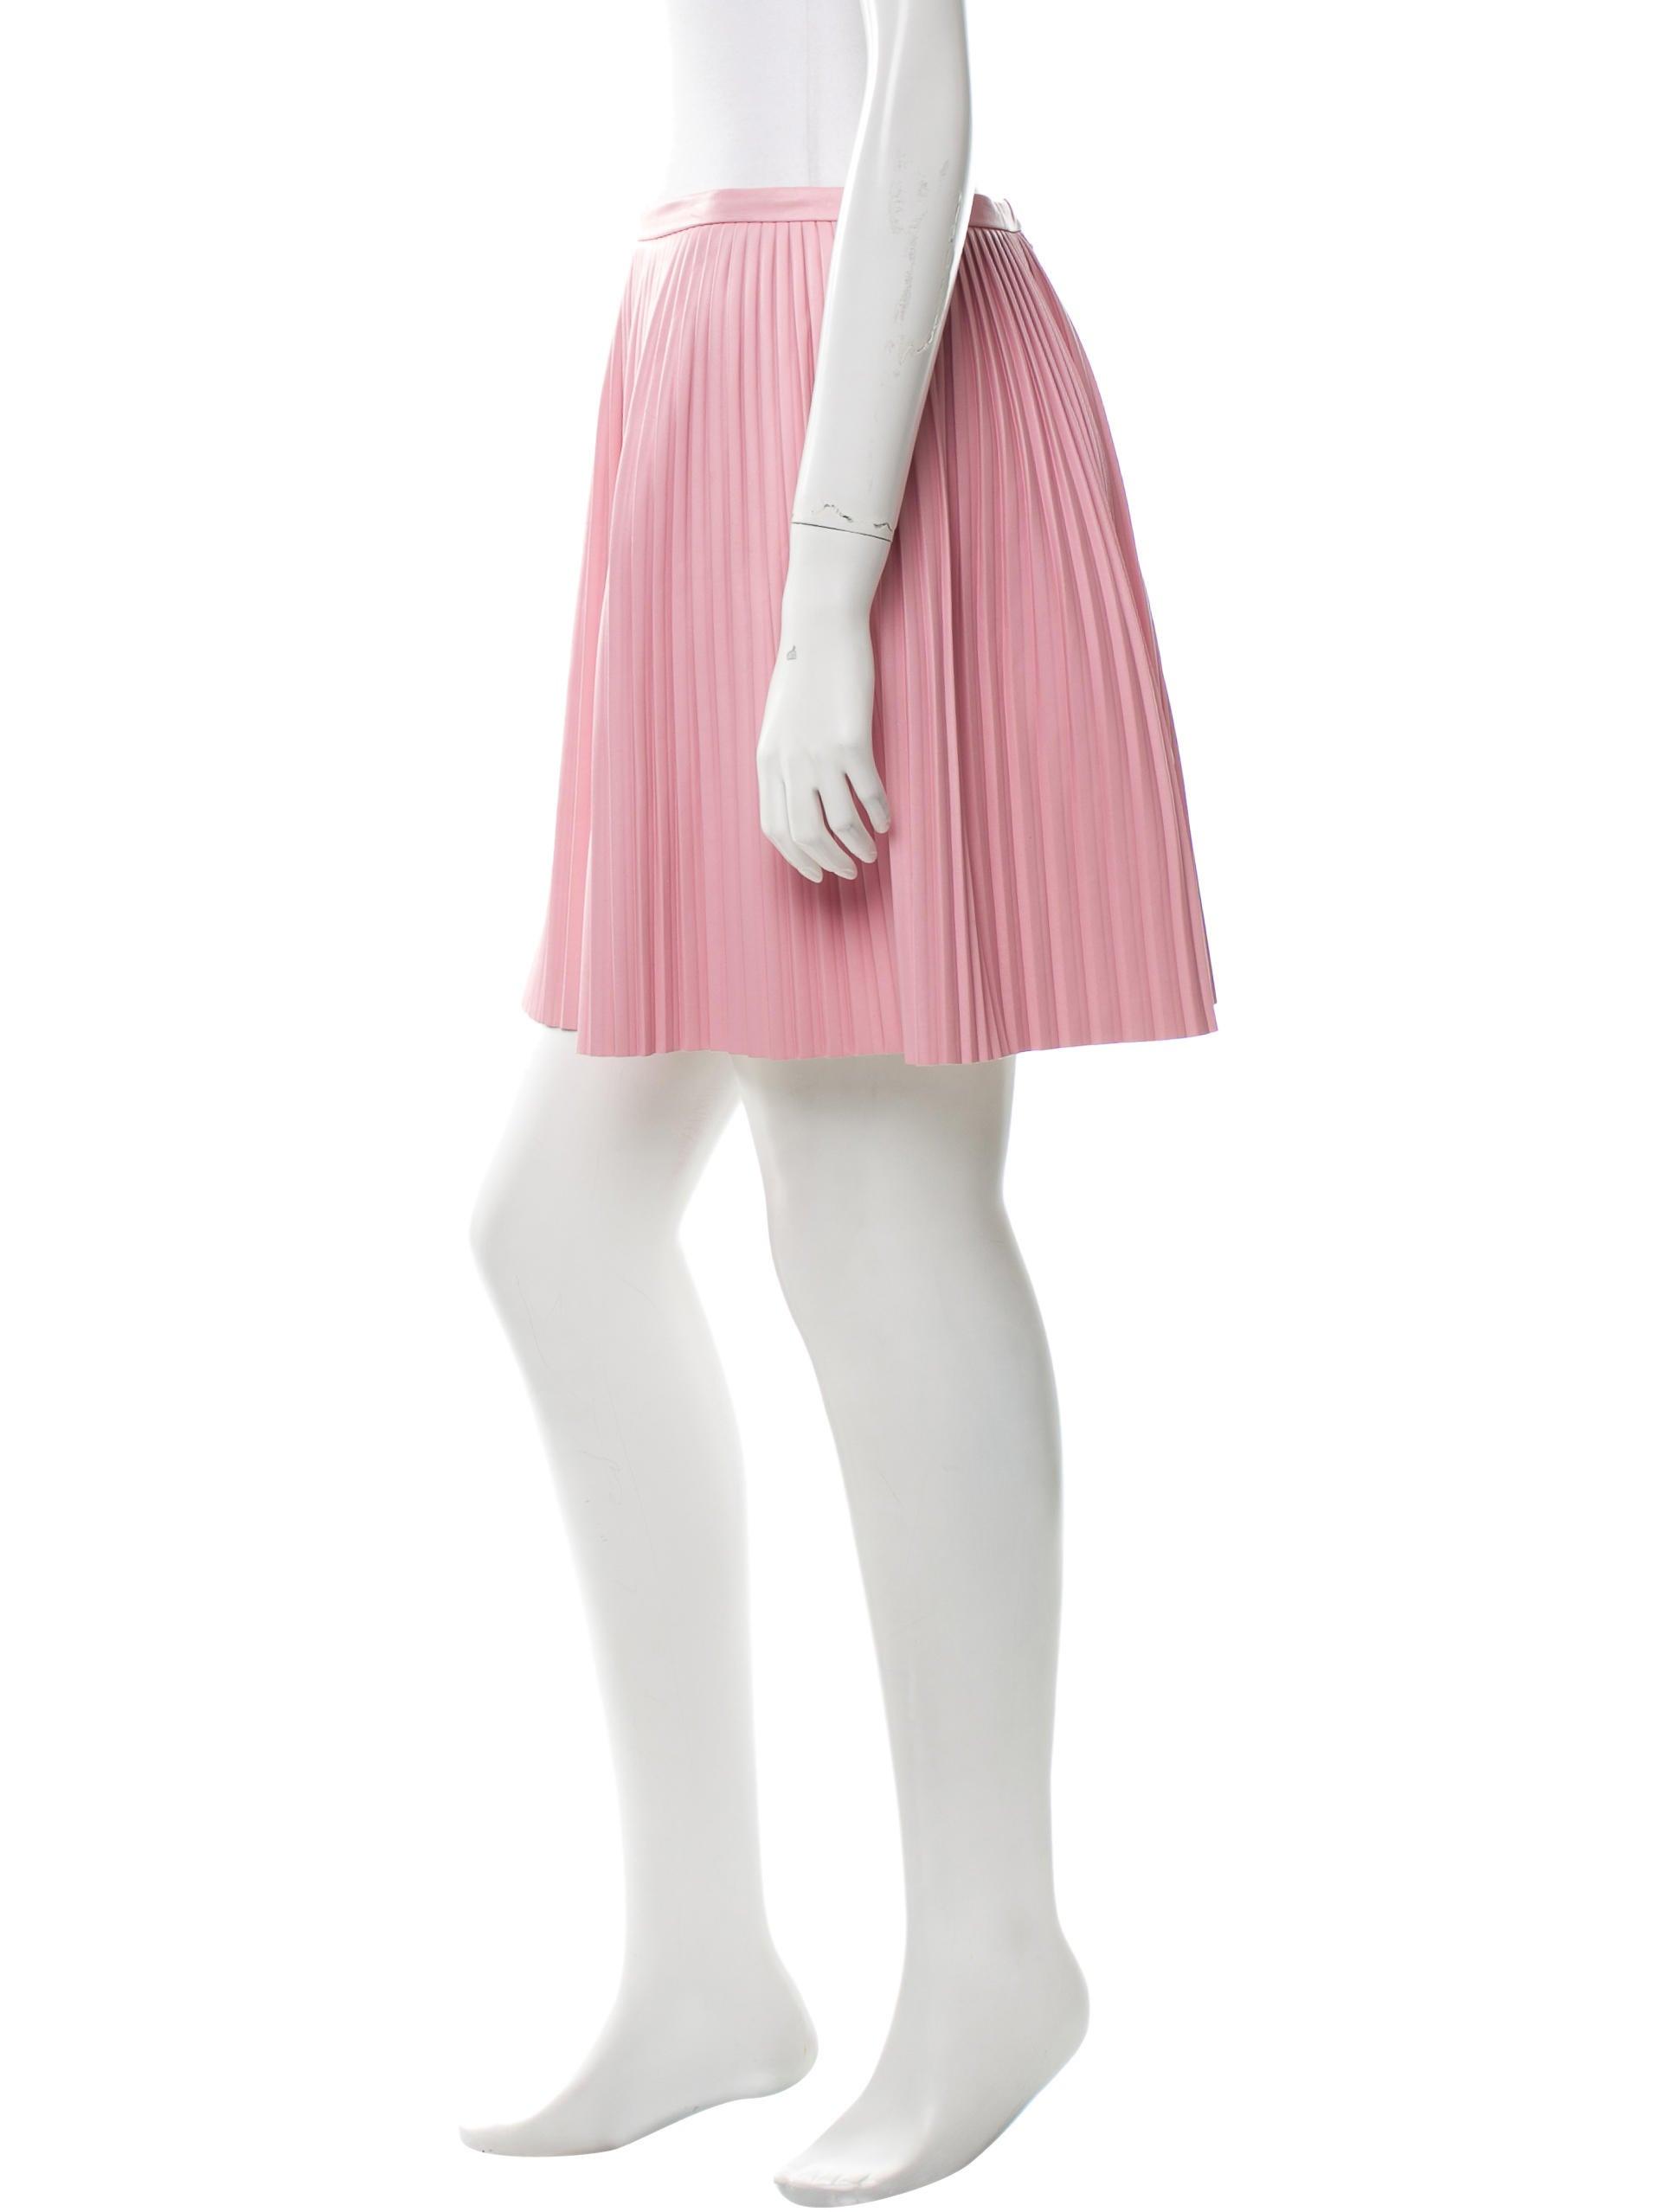 tibi vegan leather pleated skirt clothing wti30375